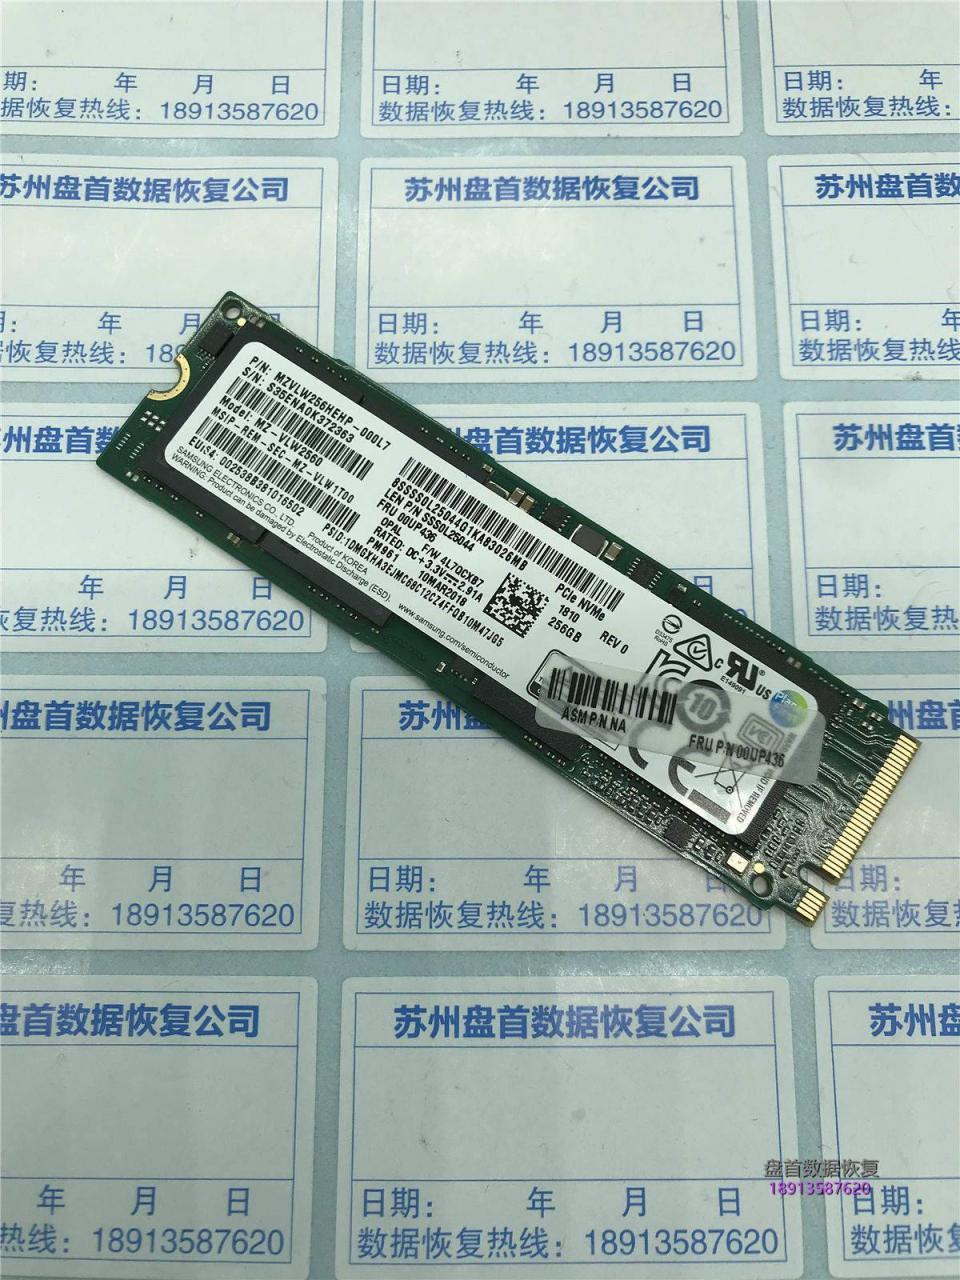 MZVLW256HEHP-000L7三星PM961系统卡死掉盘无法识别数据恢复